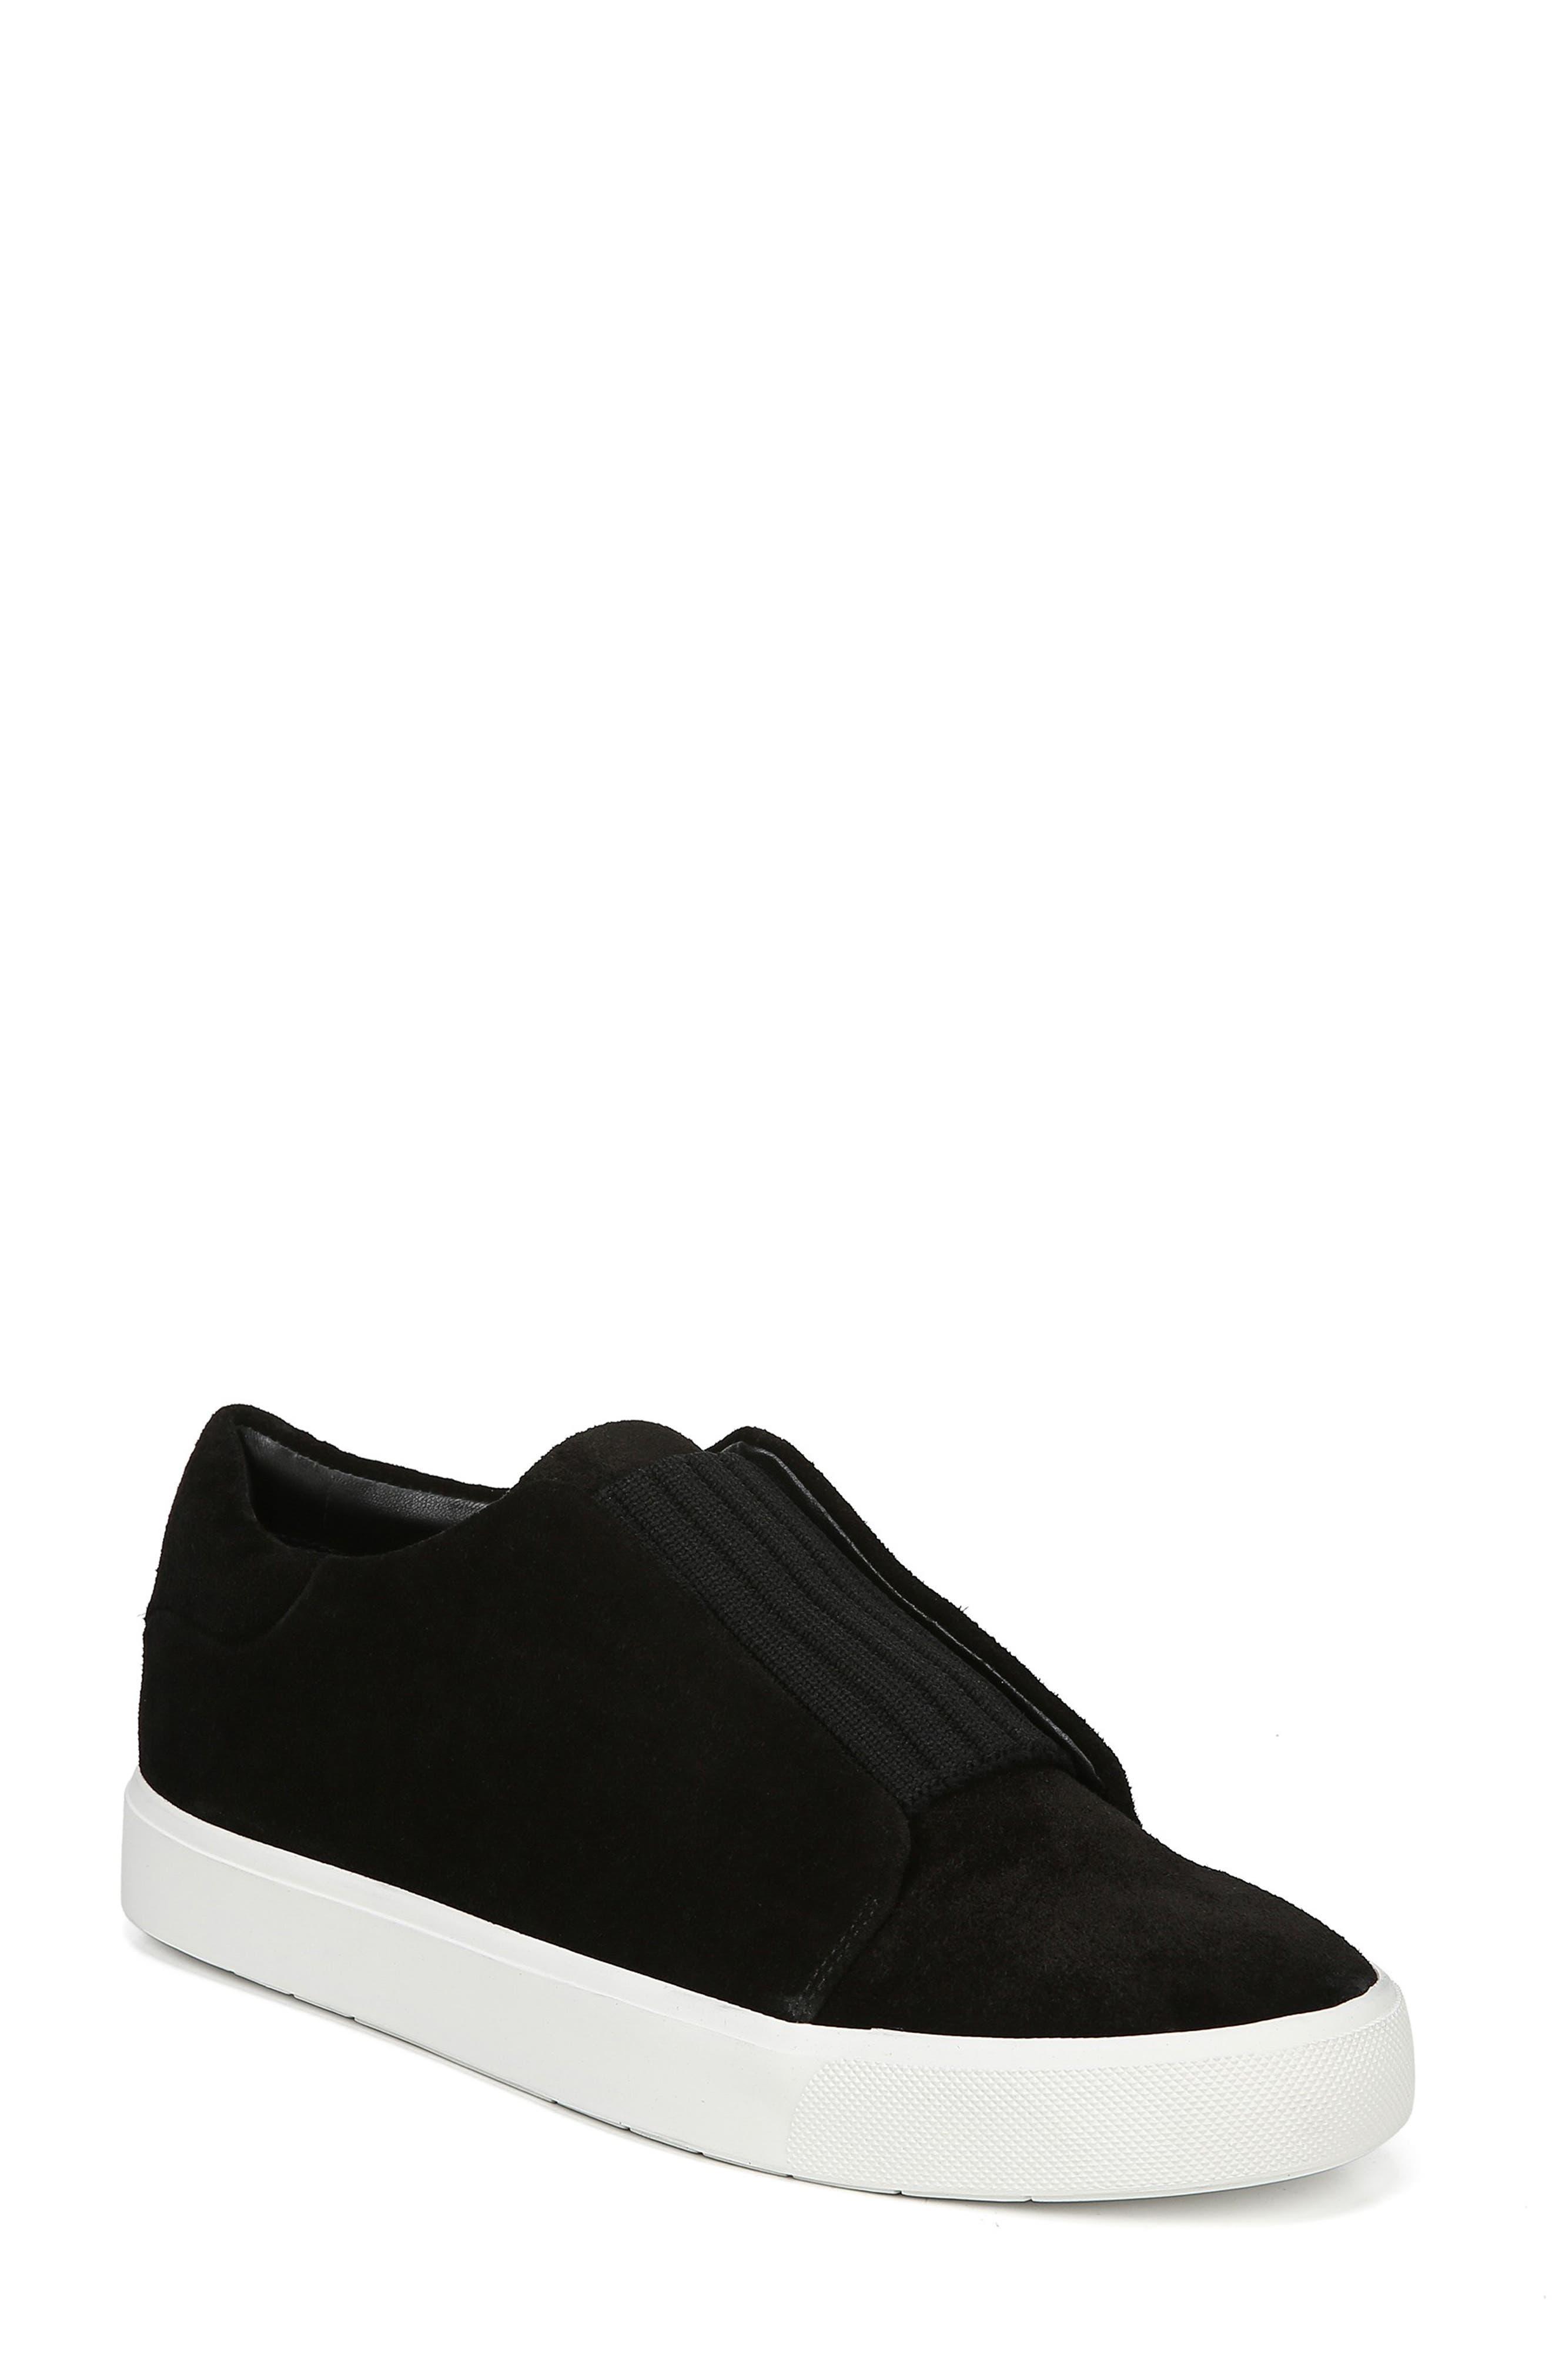 Cantara Slip-On Sneaker,                             Main thumbnail 1, color,                             BLACK SUEDE